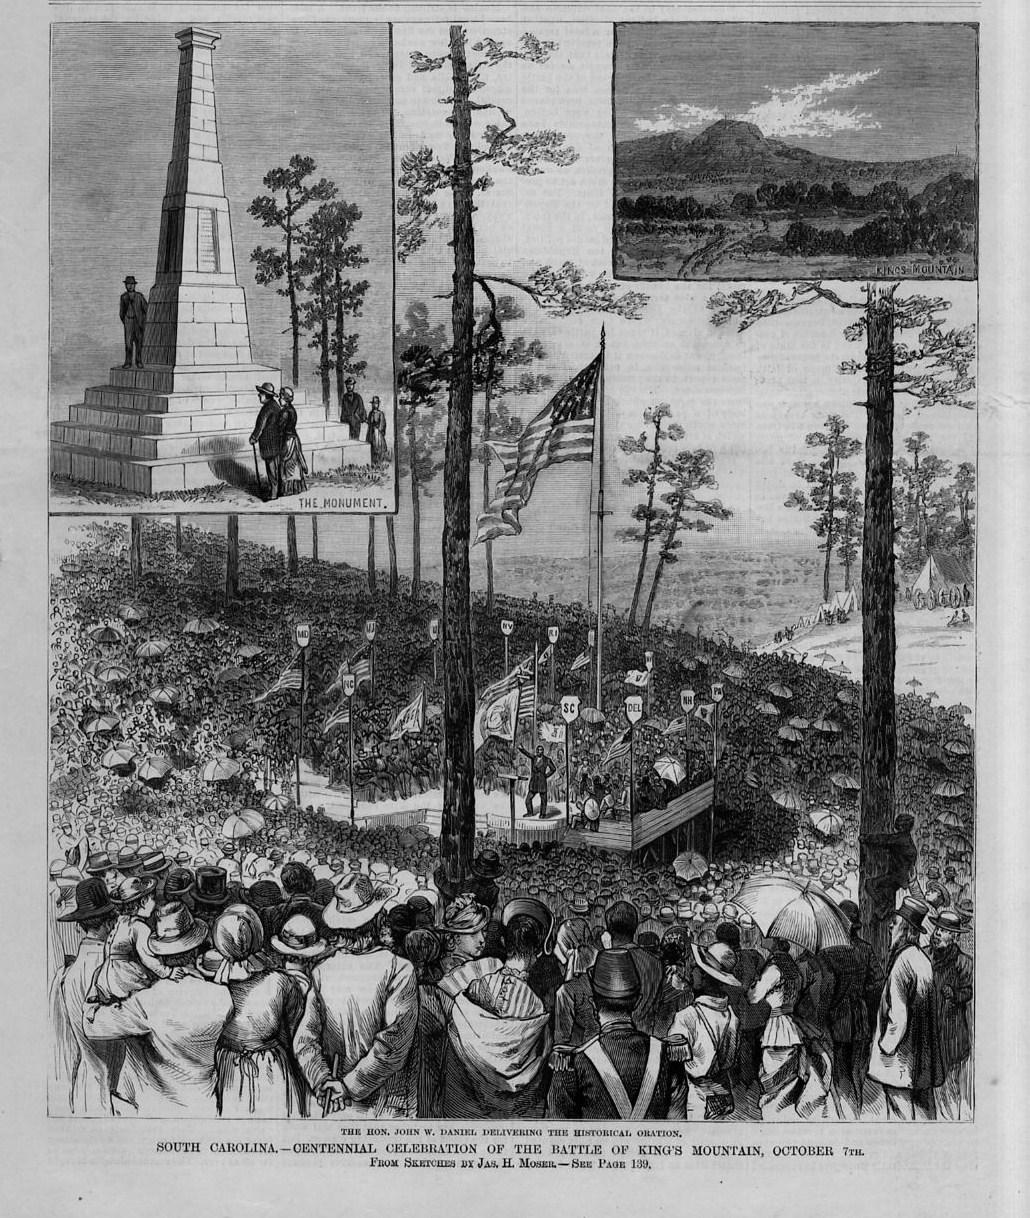 Cover of Frank Leslie's Illustrated Newspaper depicting the celebration